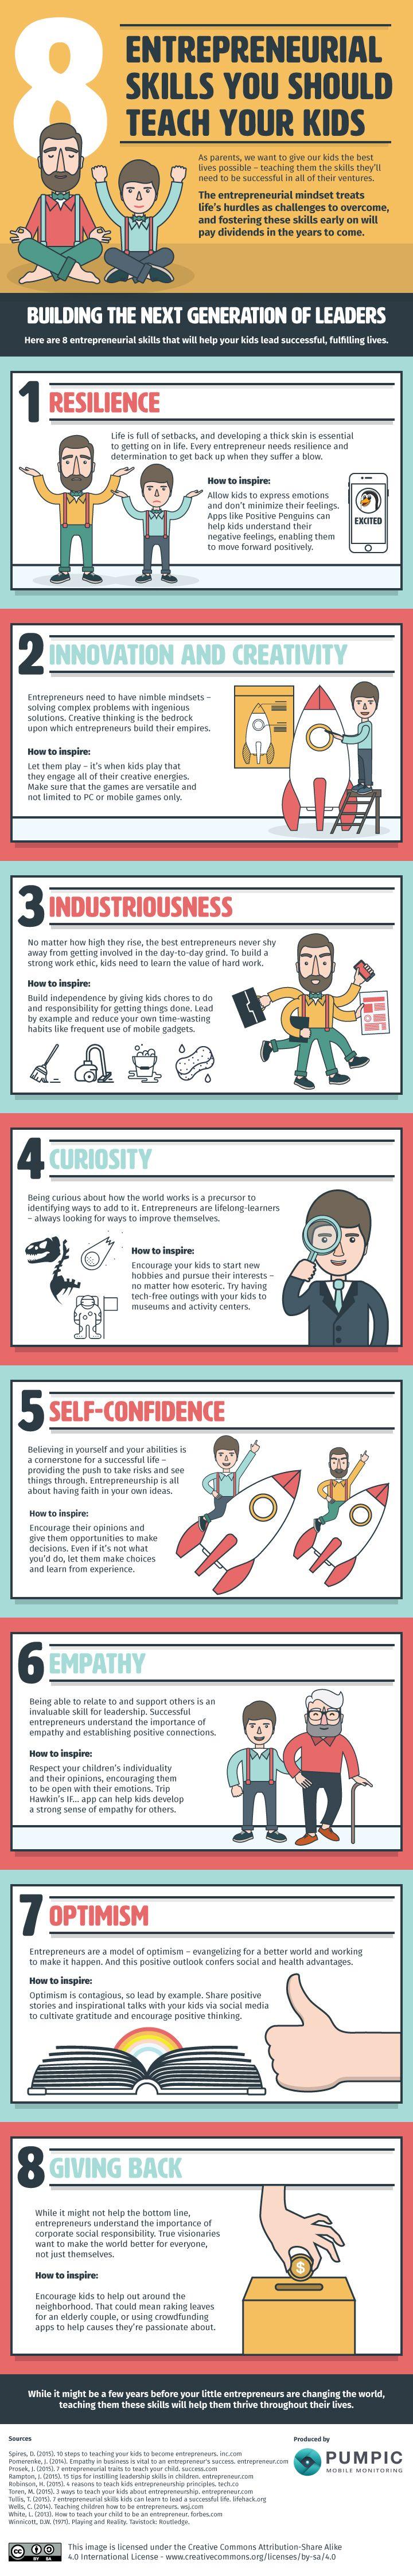 Infographic: 8 entrepreneurial skills you should teach your kids - Matador Network